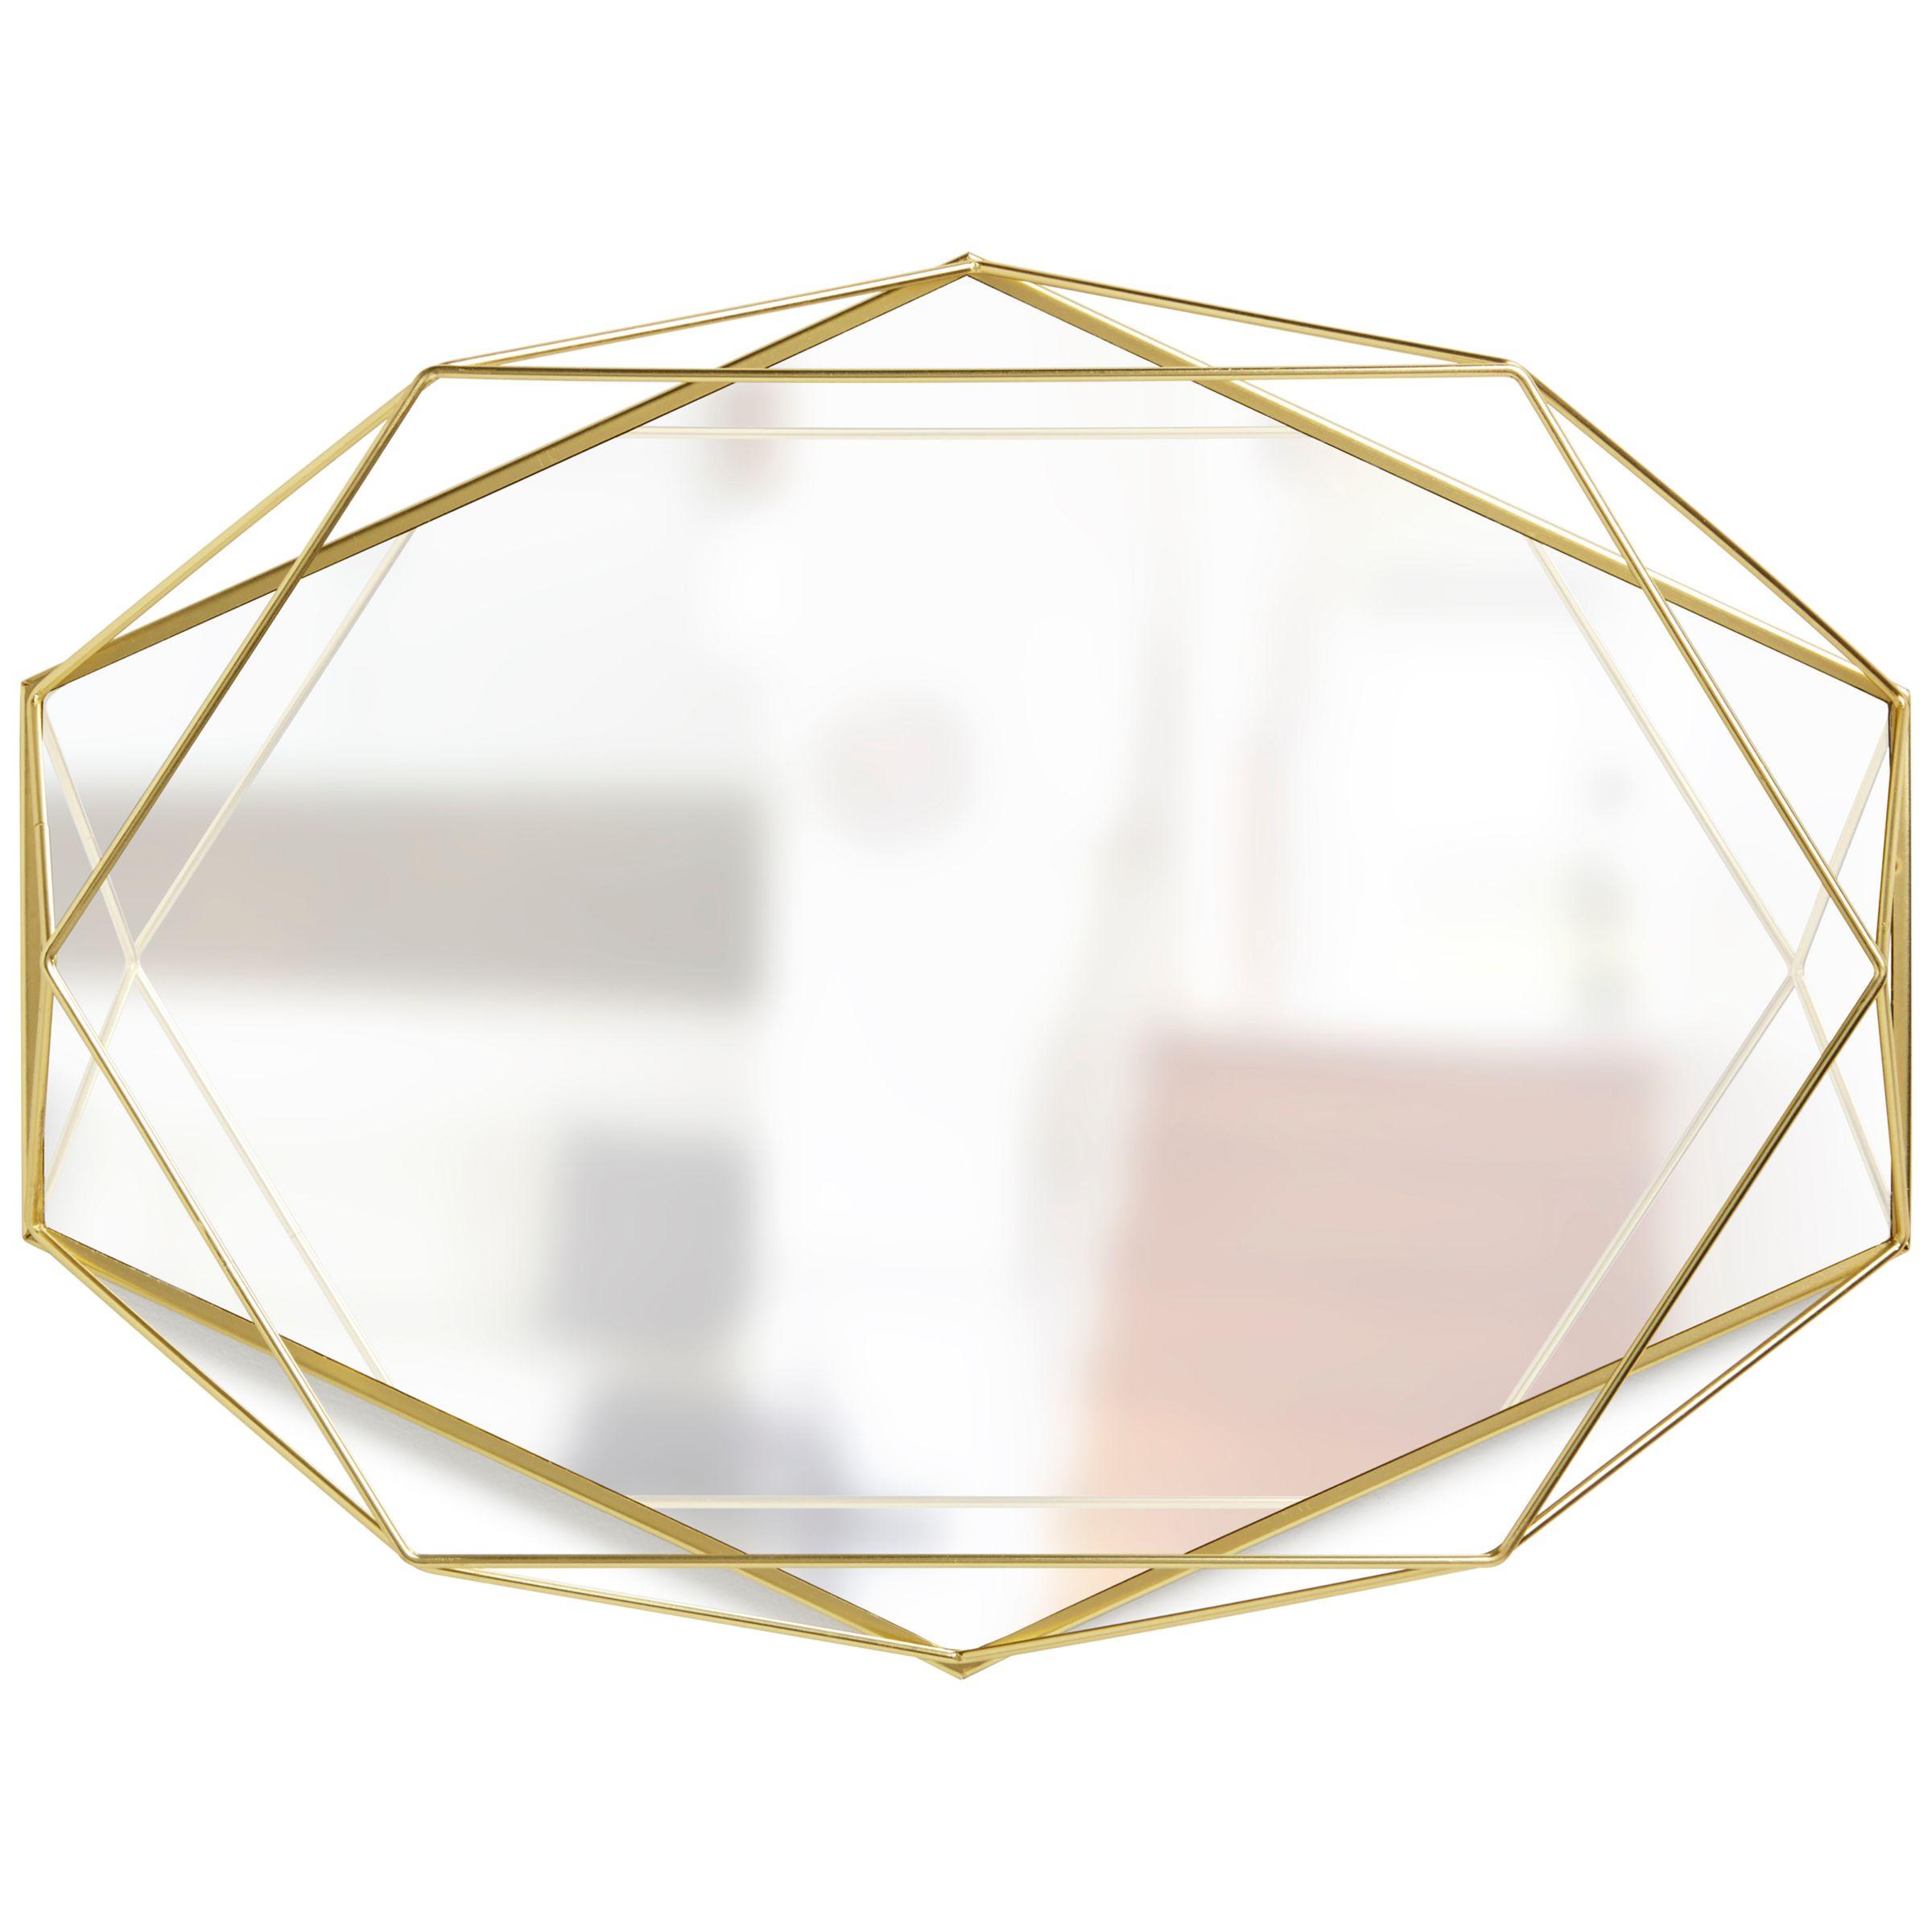 Umbra Umbra Prisma Wall Mirror, 43 x 57cm